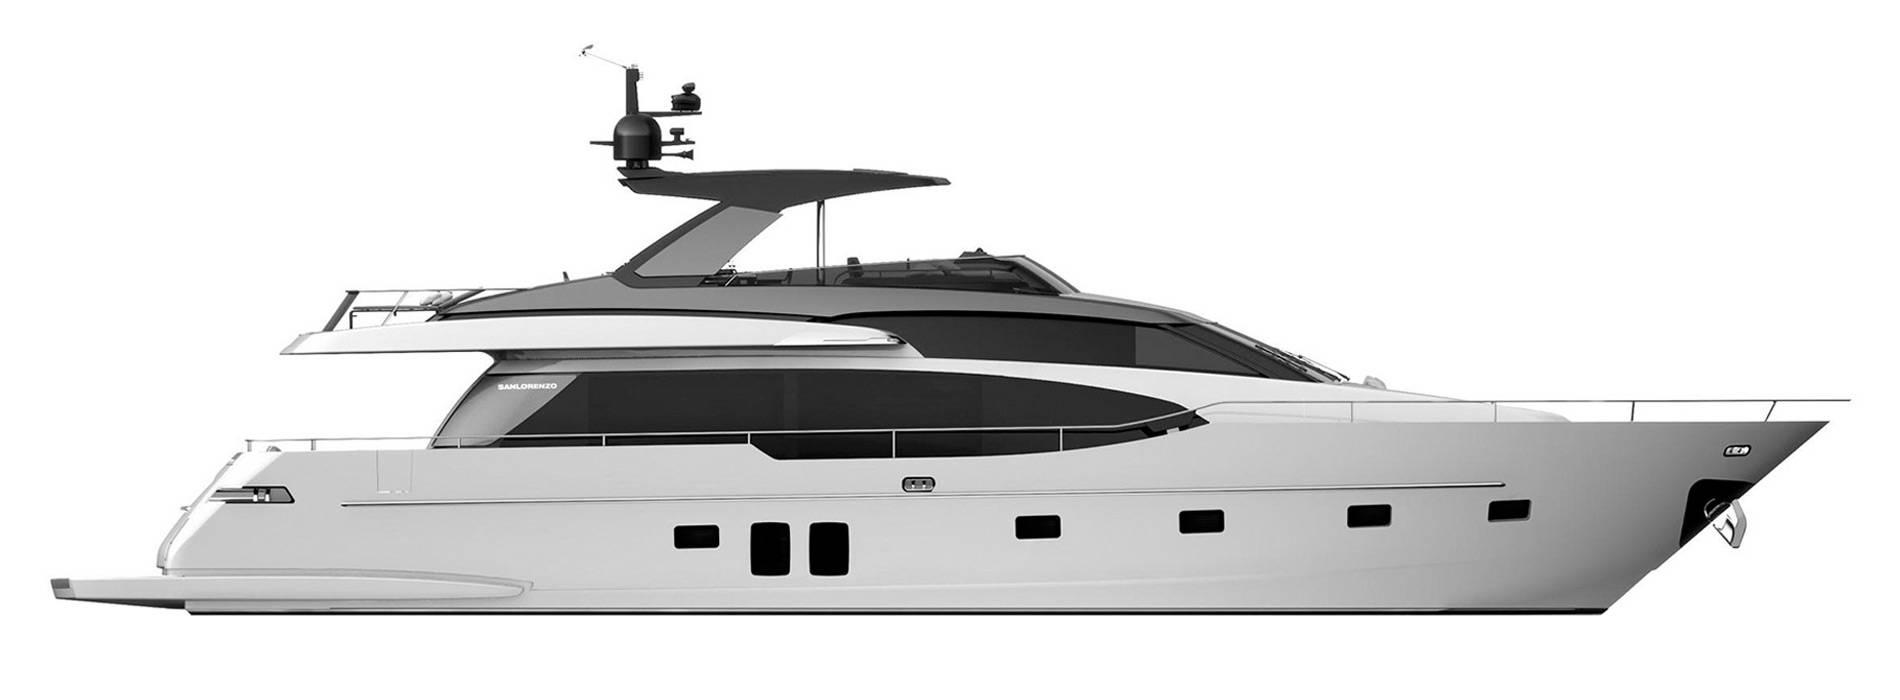 Sanlorenzo Yachts SL78 外观